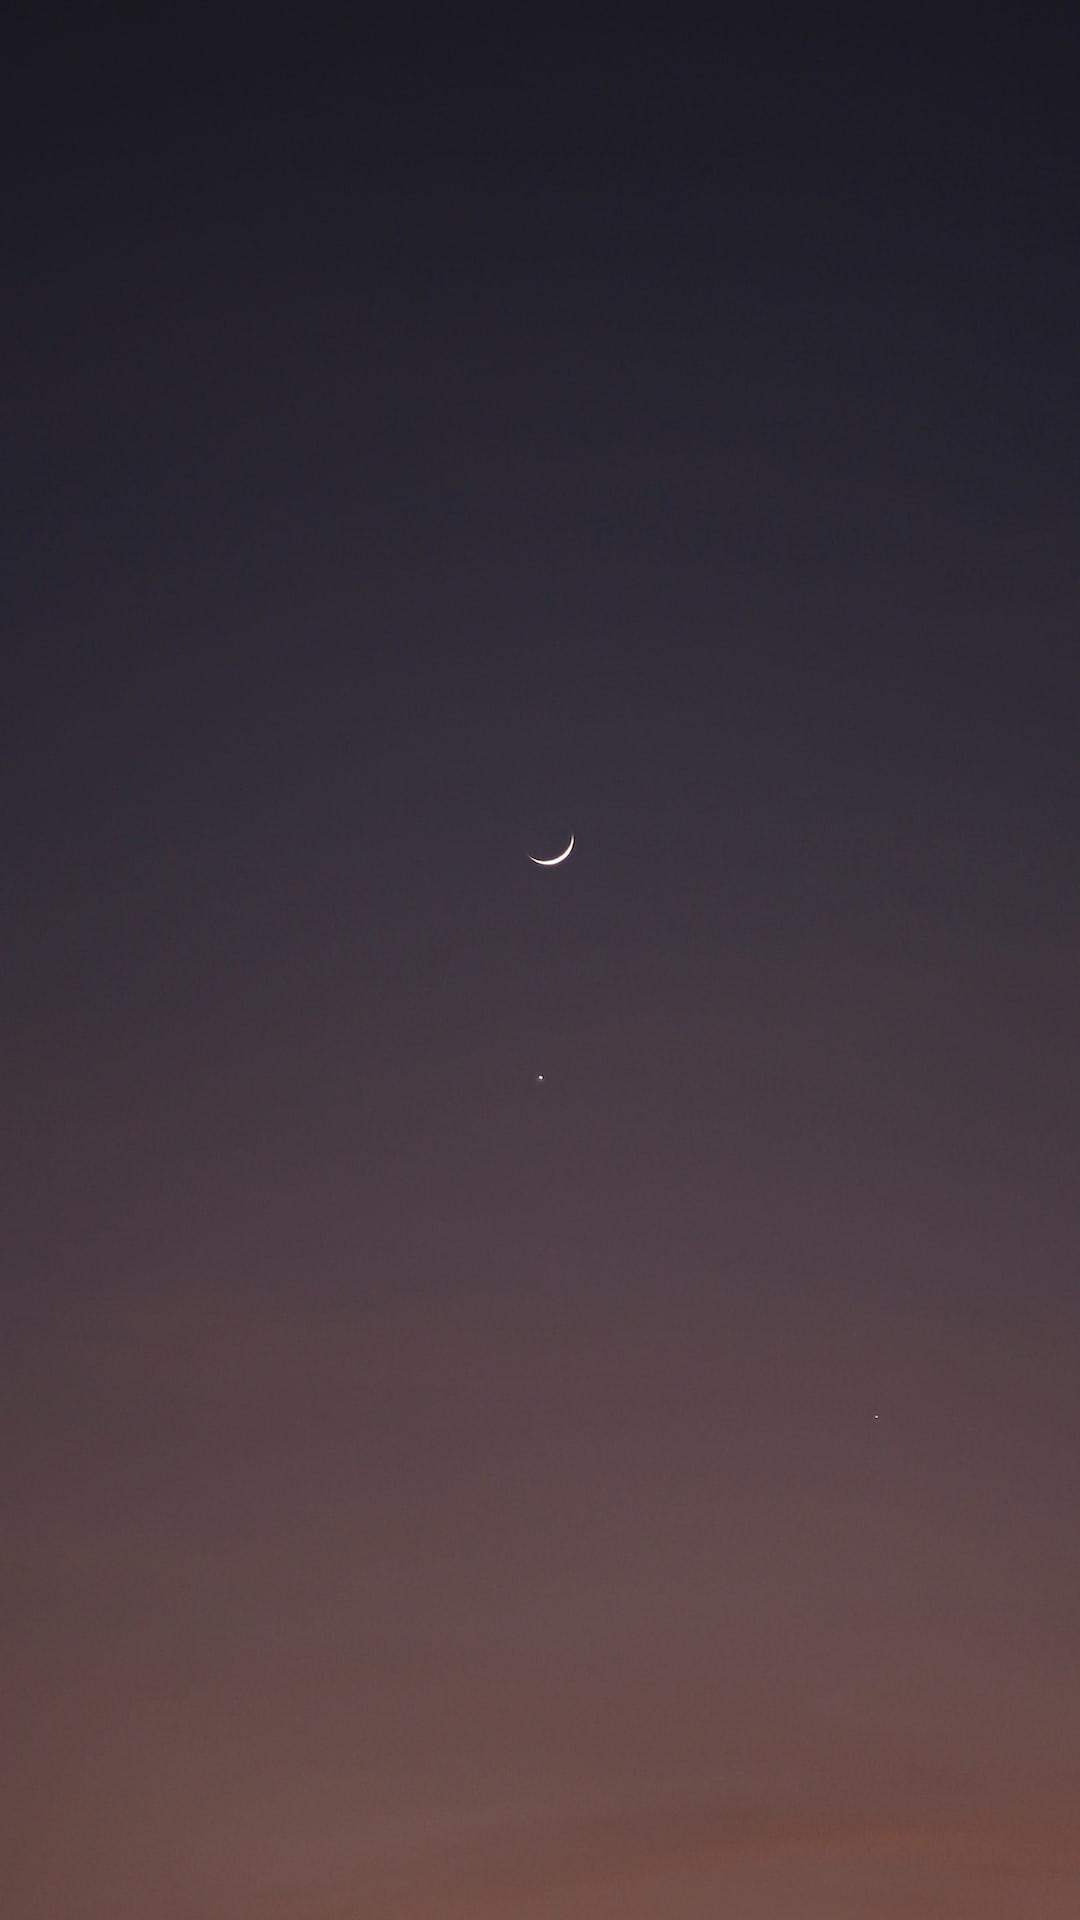 The moon, Venus and Saturn.